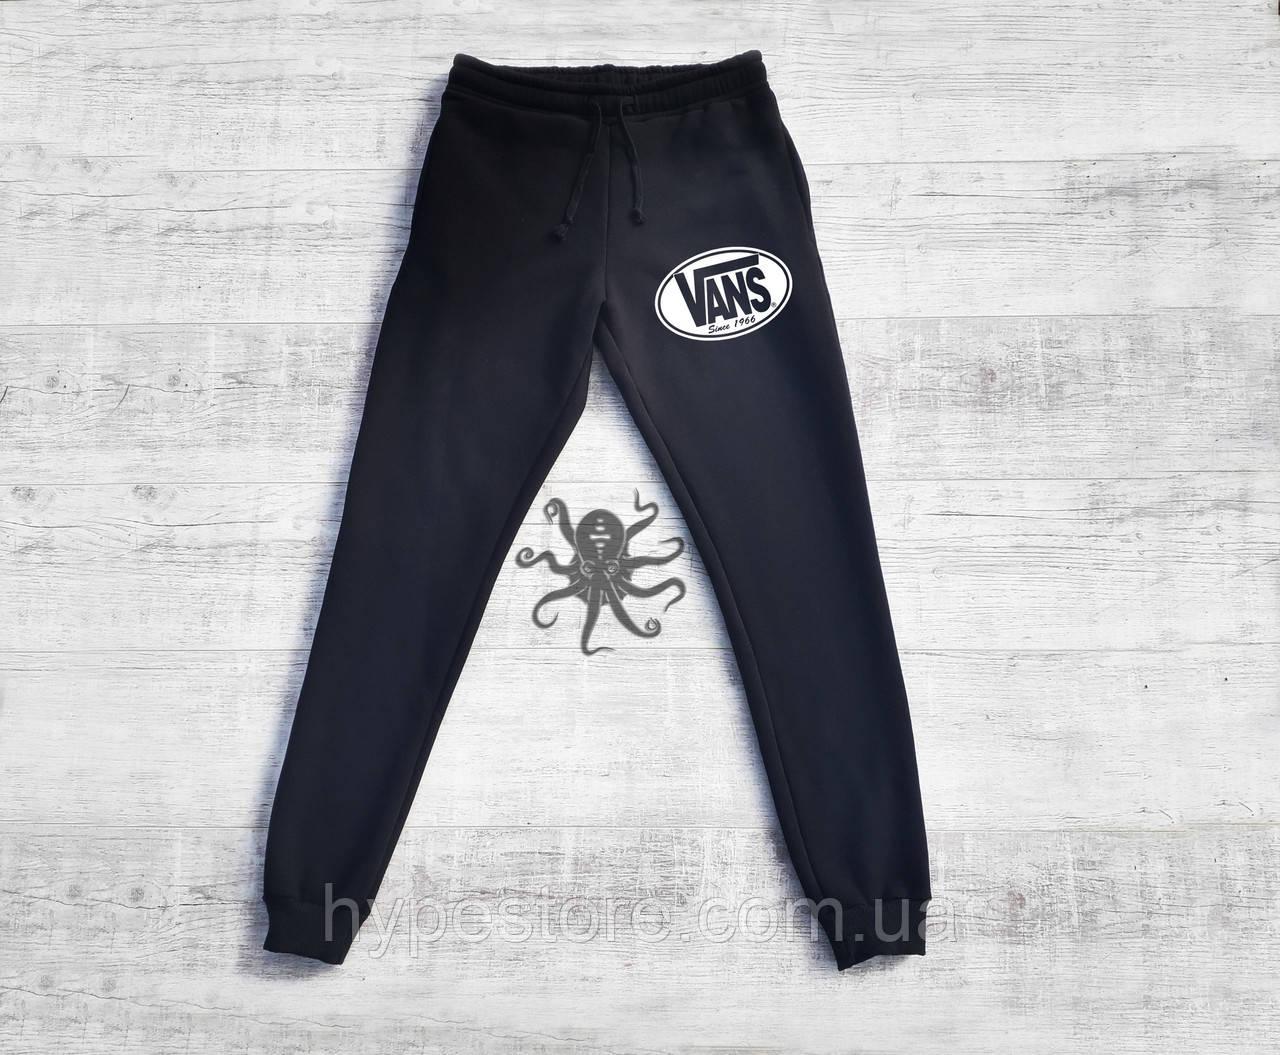 Спортивные штаны на флисе, чоловічі штани Vans, Реплика